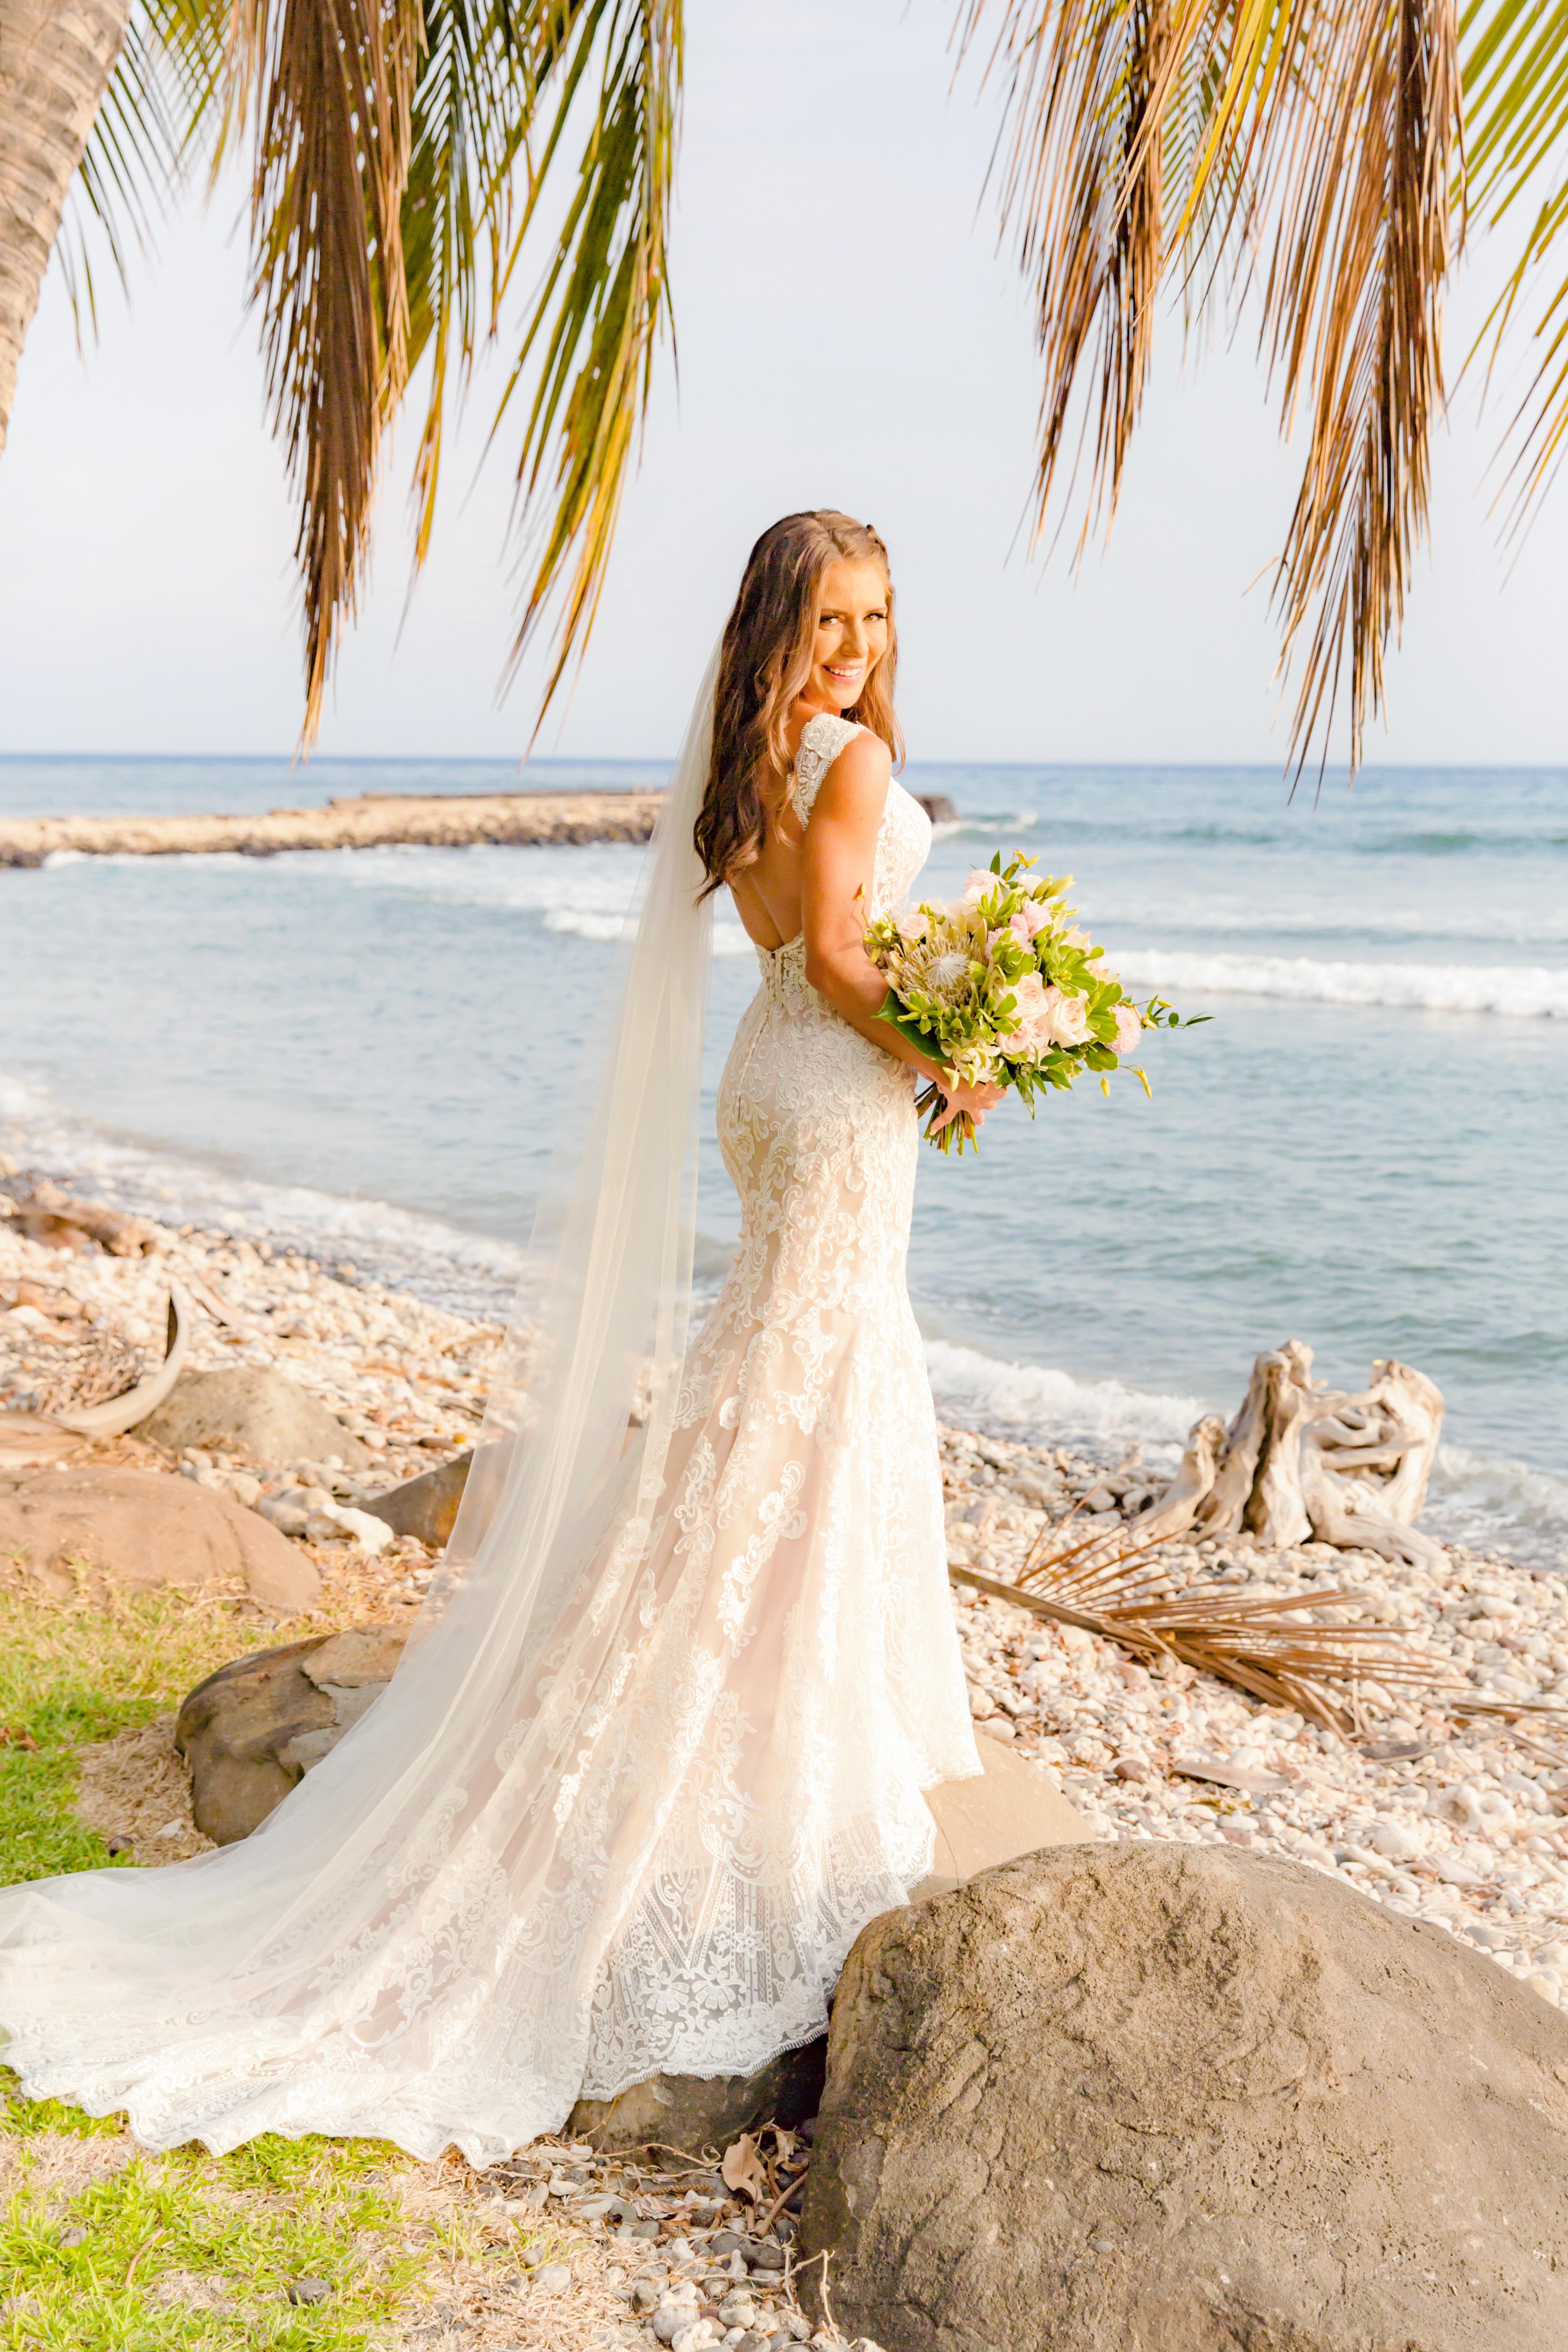 Maui Bridal Portrait | Destination Wedding in Maui | Maui Wedding Planner | Maui's Angels blog